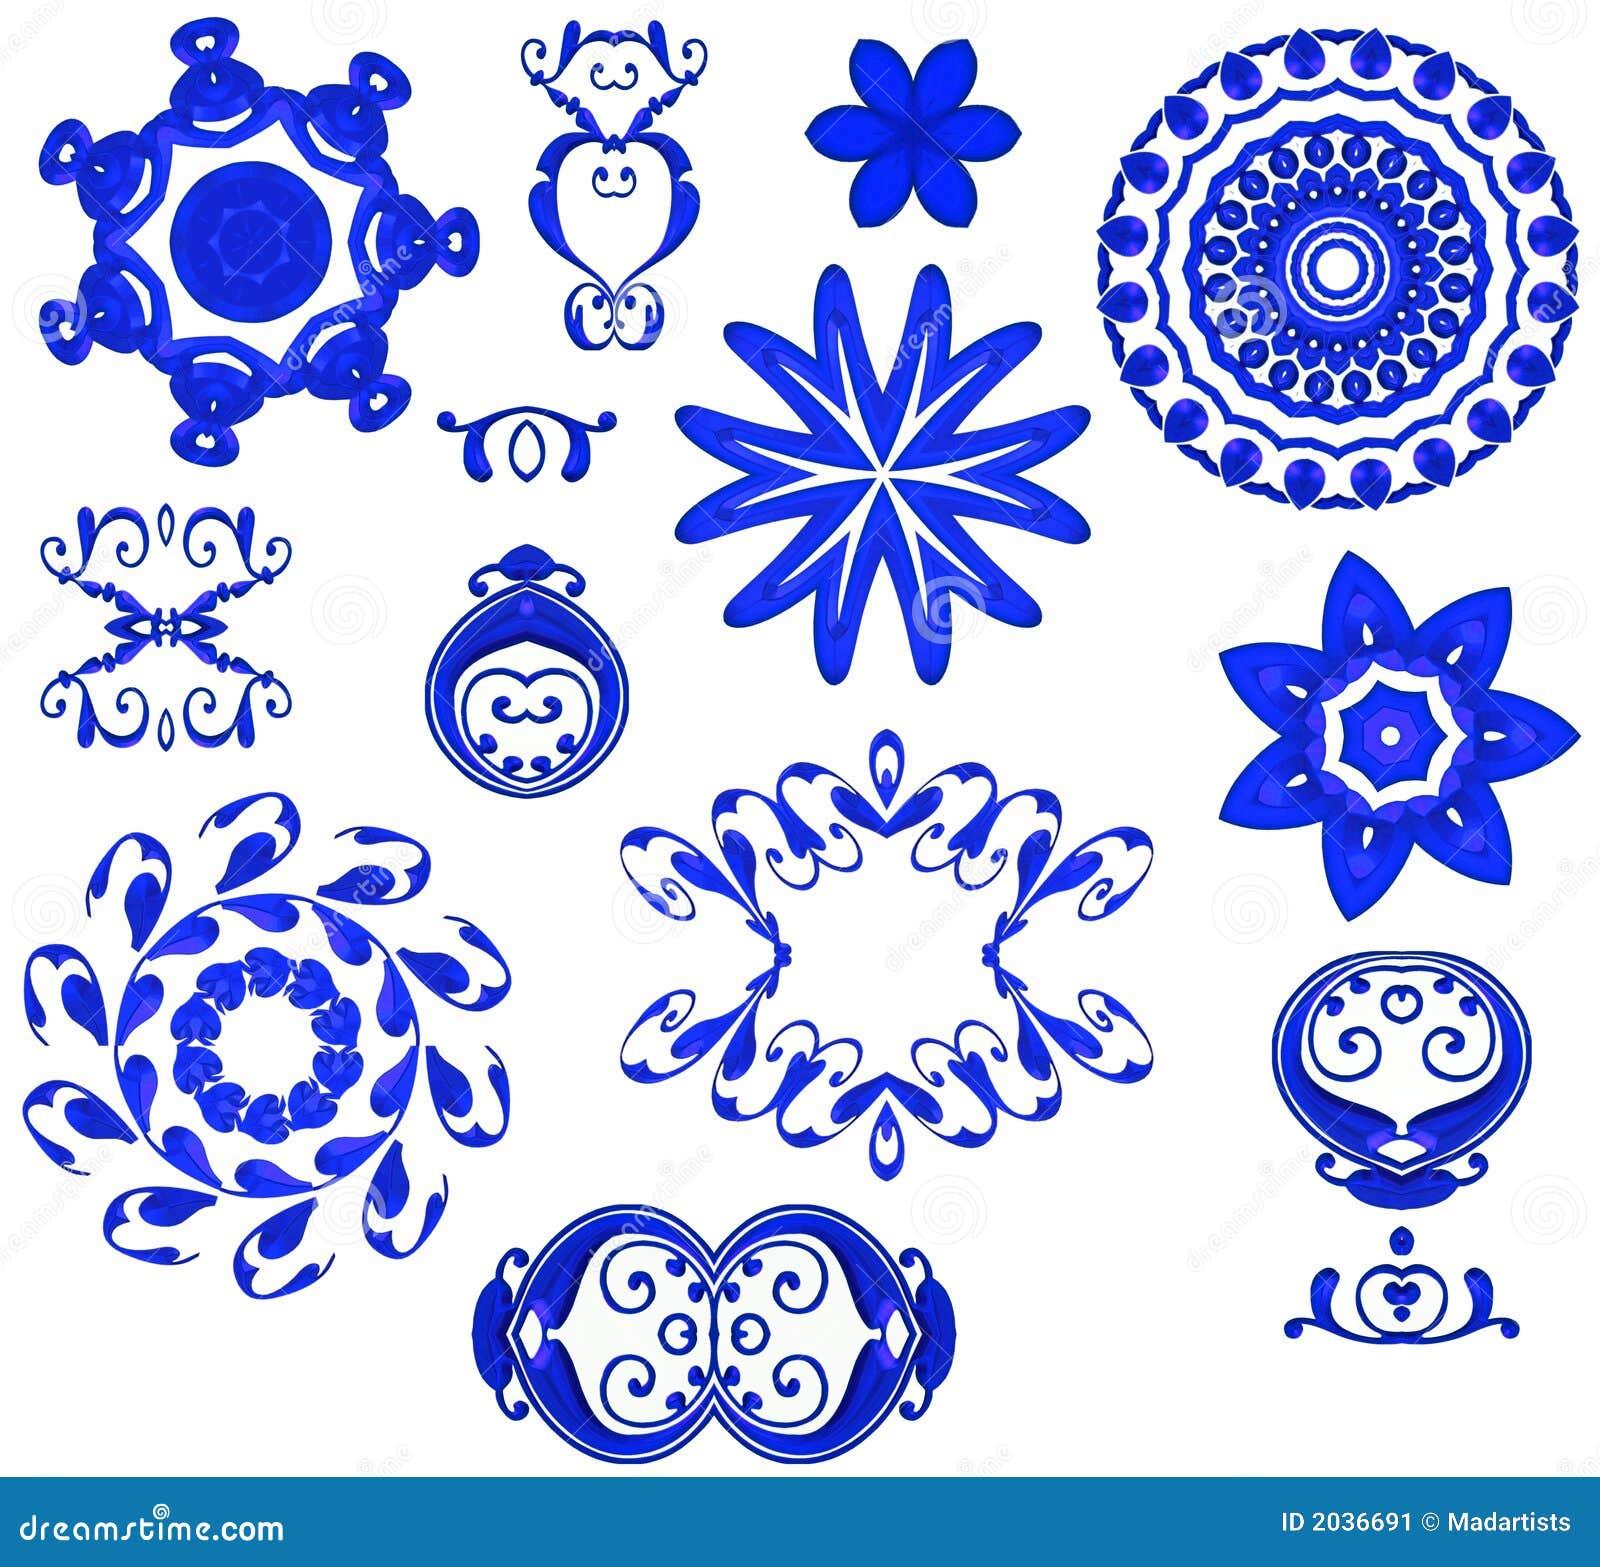 Shapes Designs Art : Decorative shapes icons blue stock illustration image